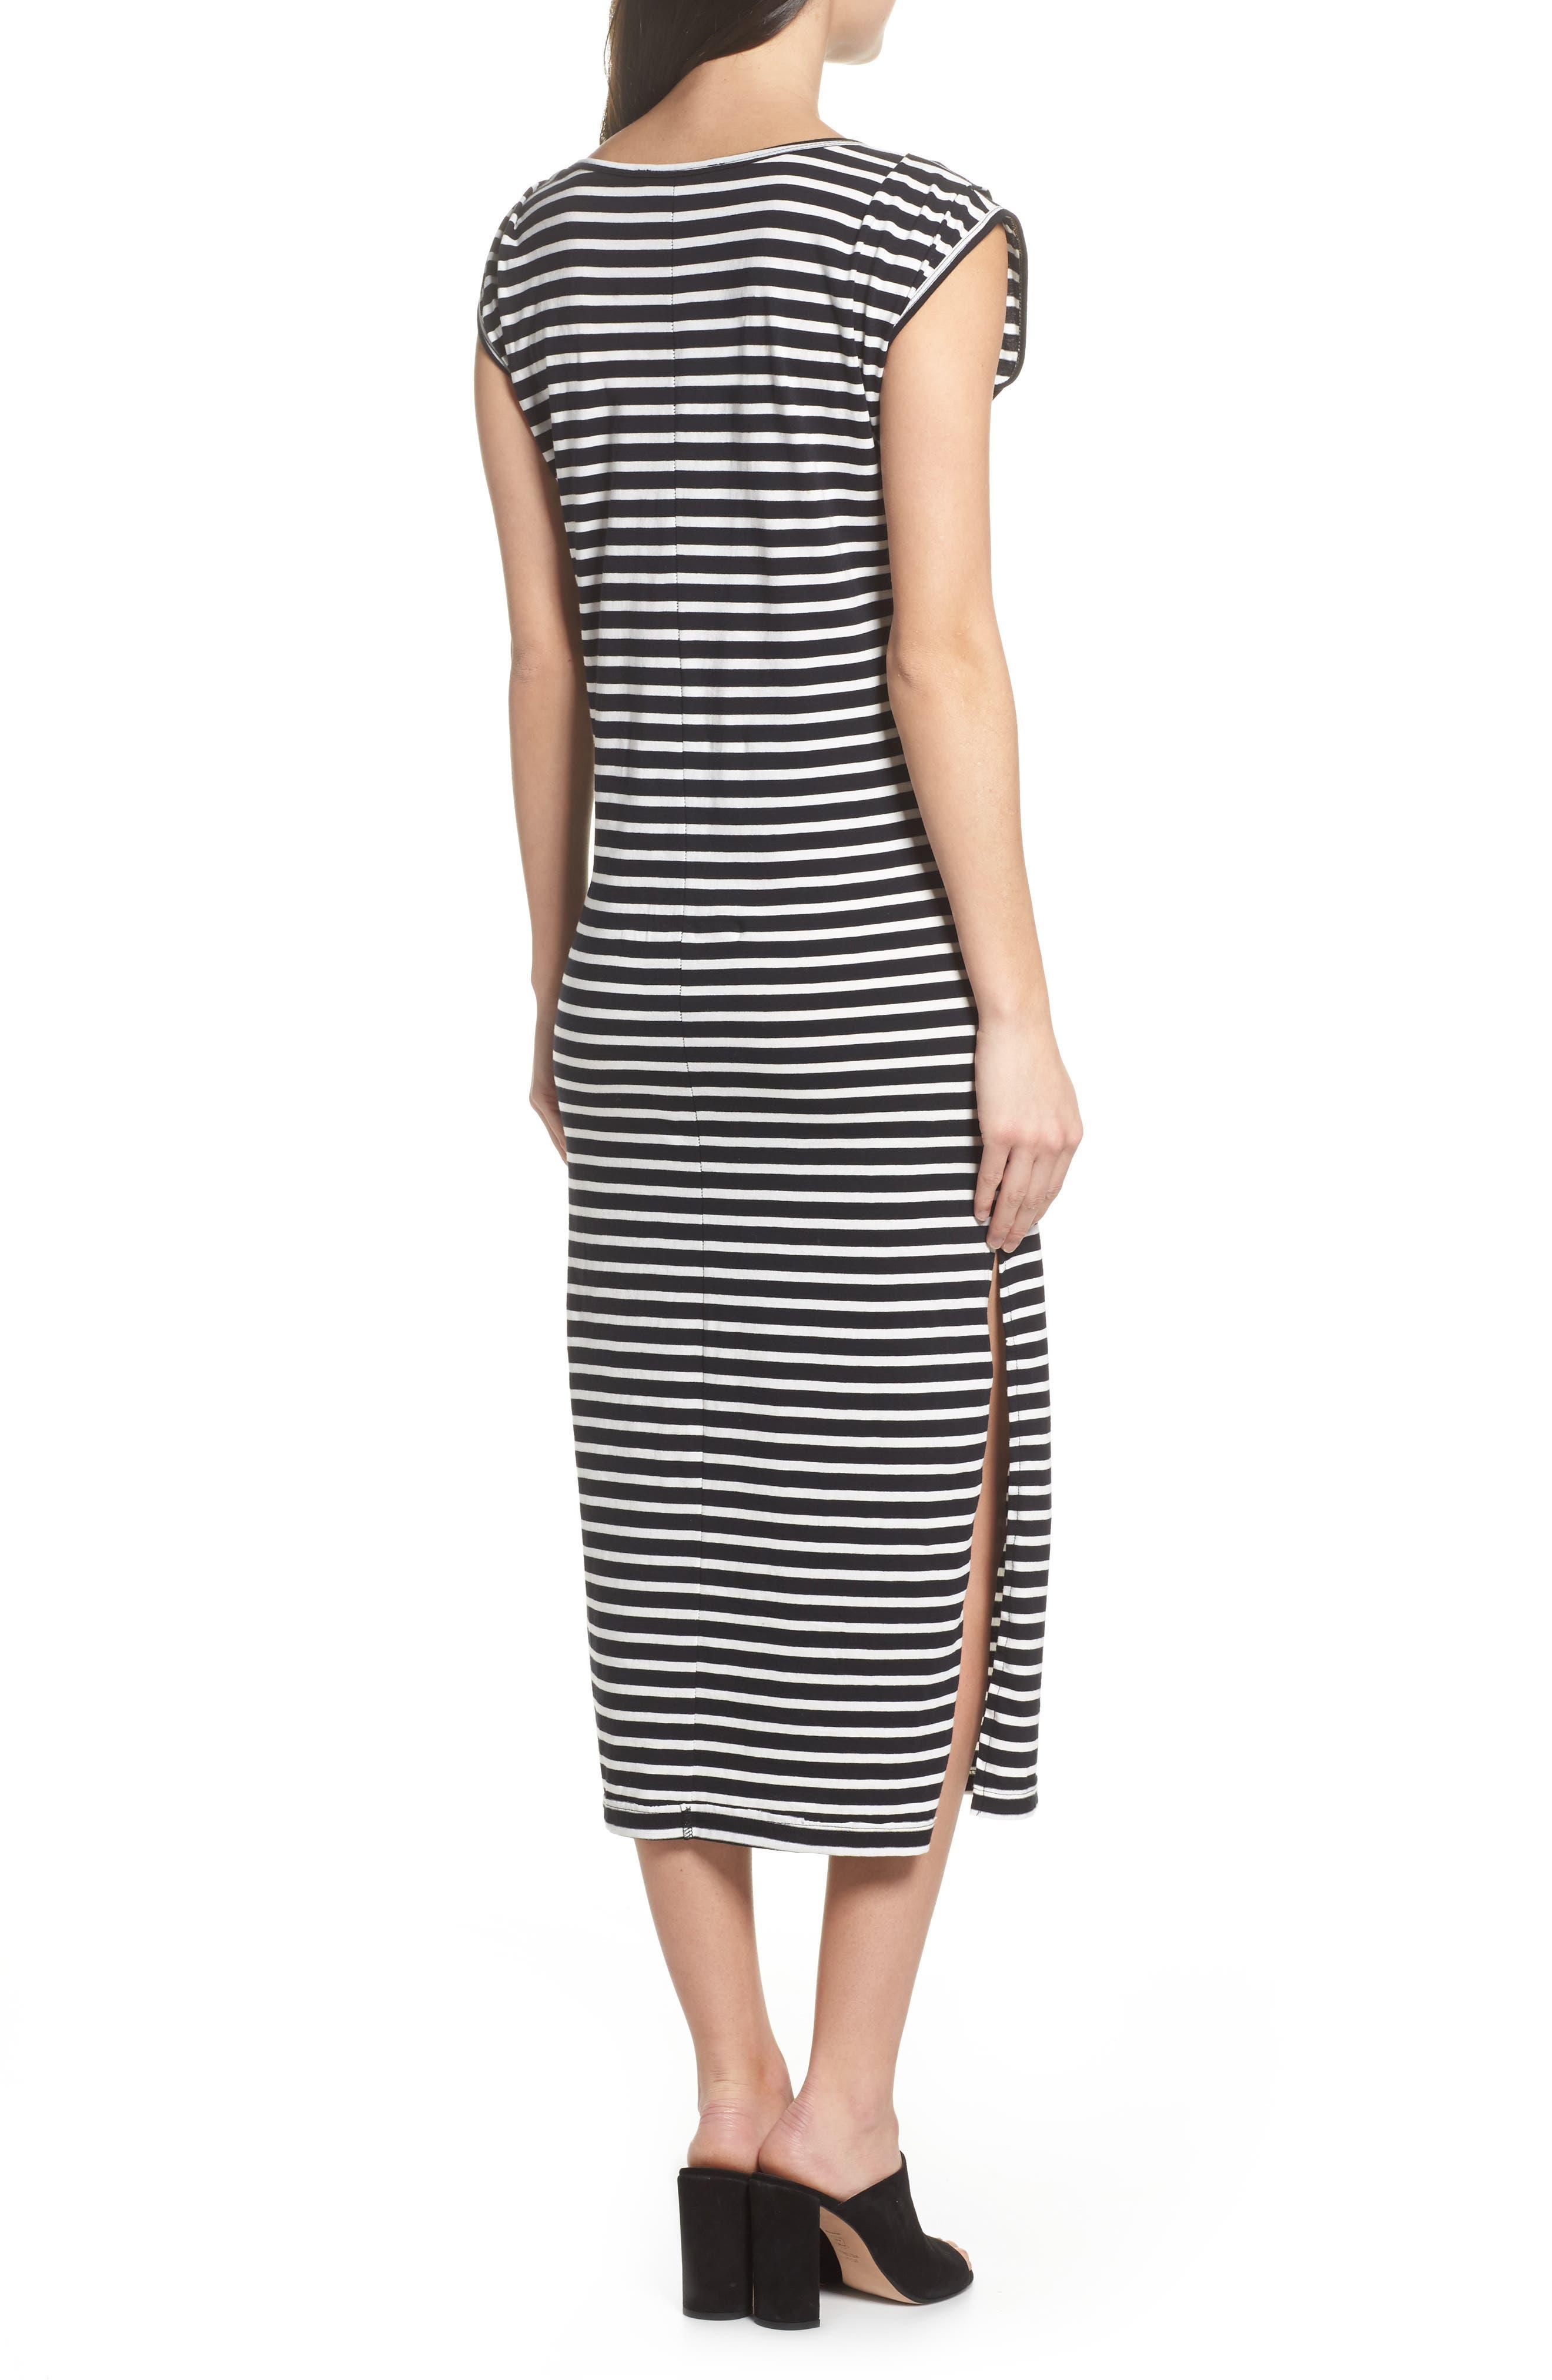 Solana Stripe Knit Midi Dress,                             Alternate thumbnail 2, color,                             Black White Stripe